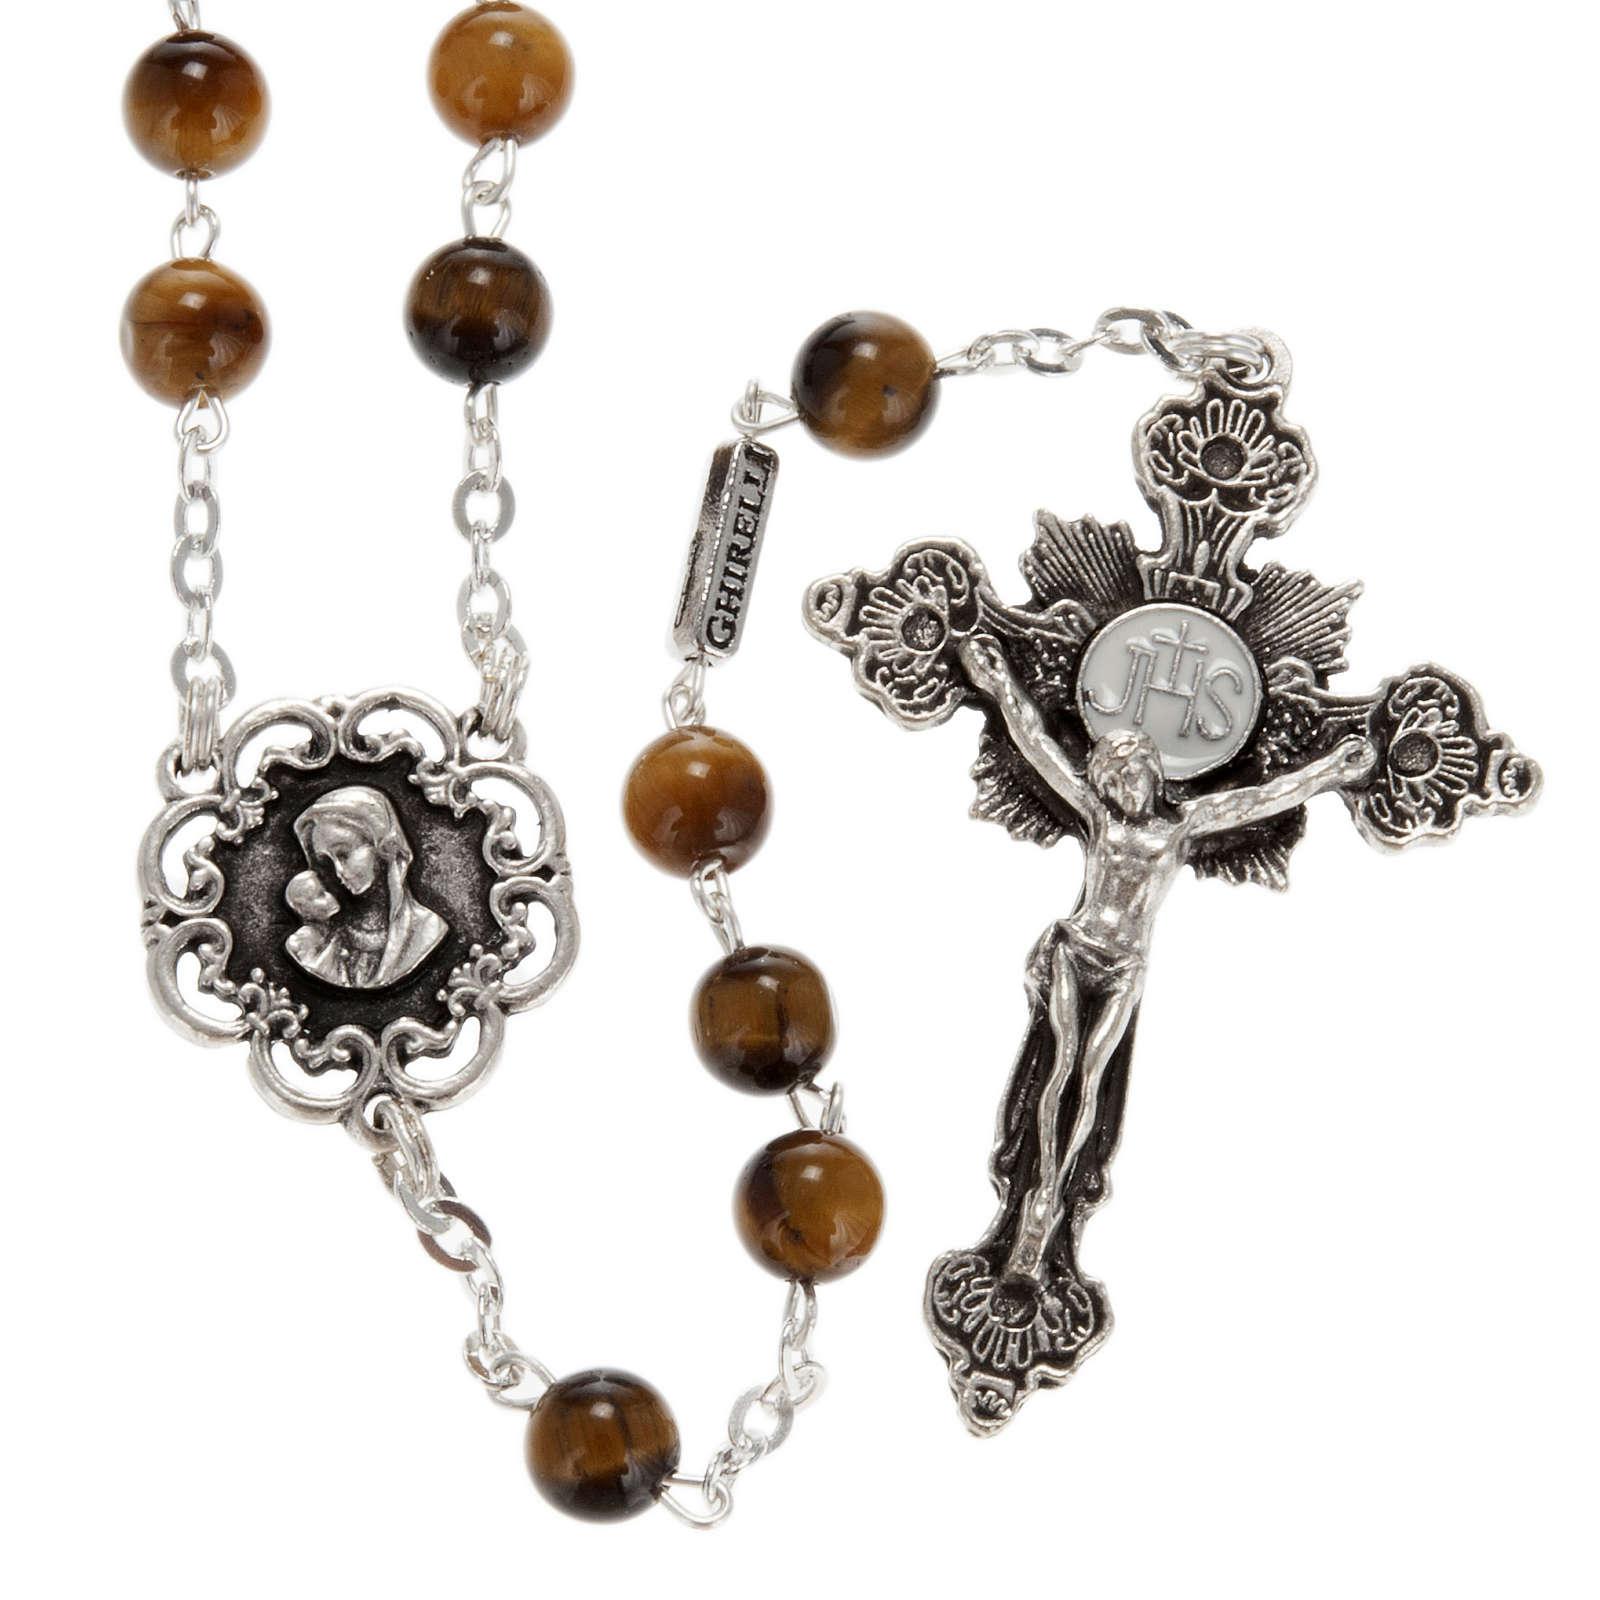 Ghirelli rosary in tiger's eye 6mm 4